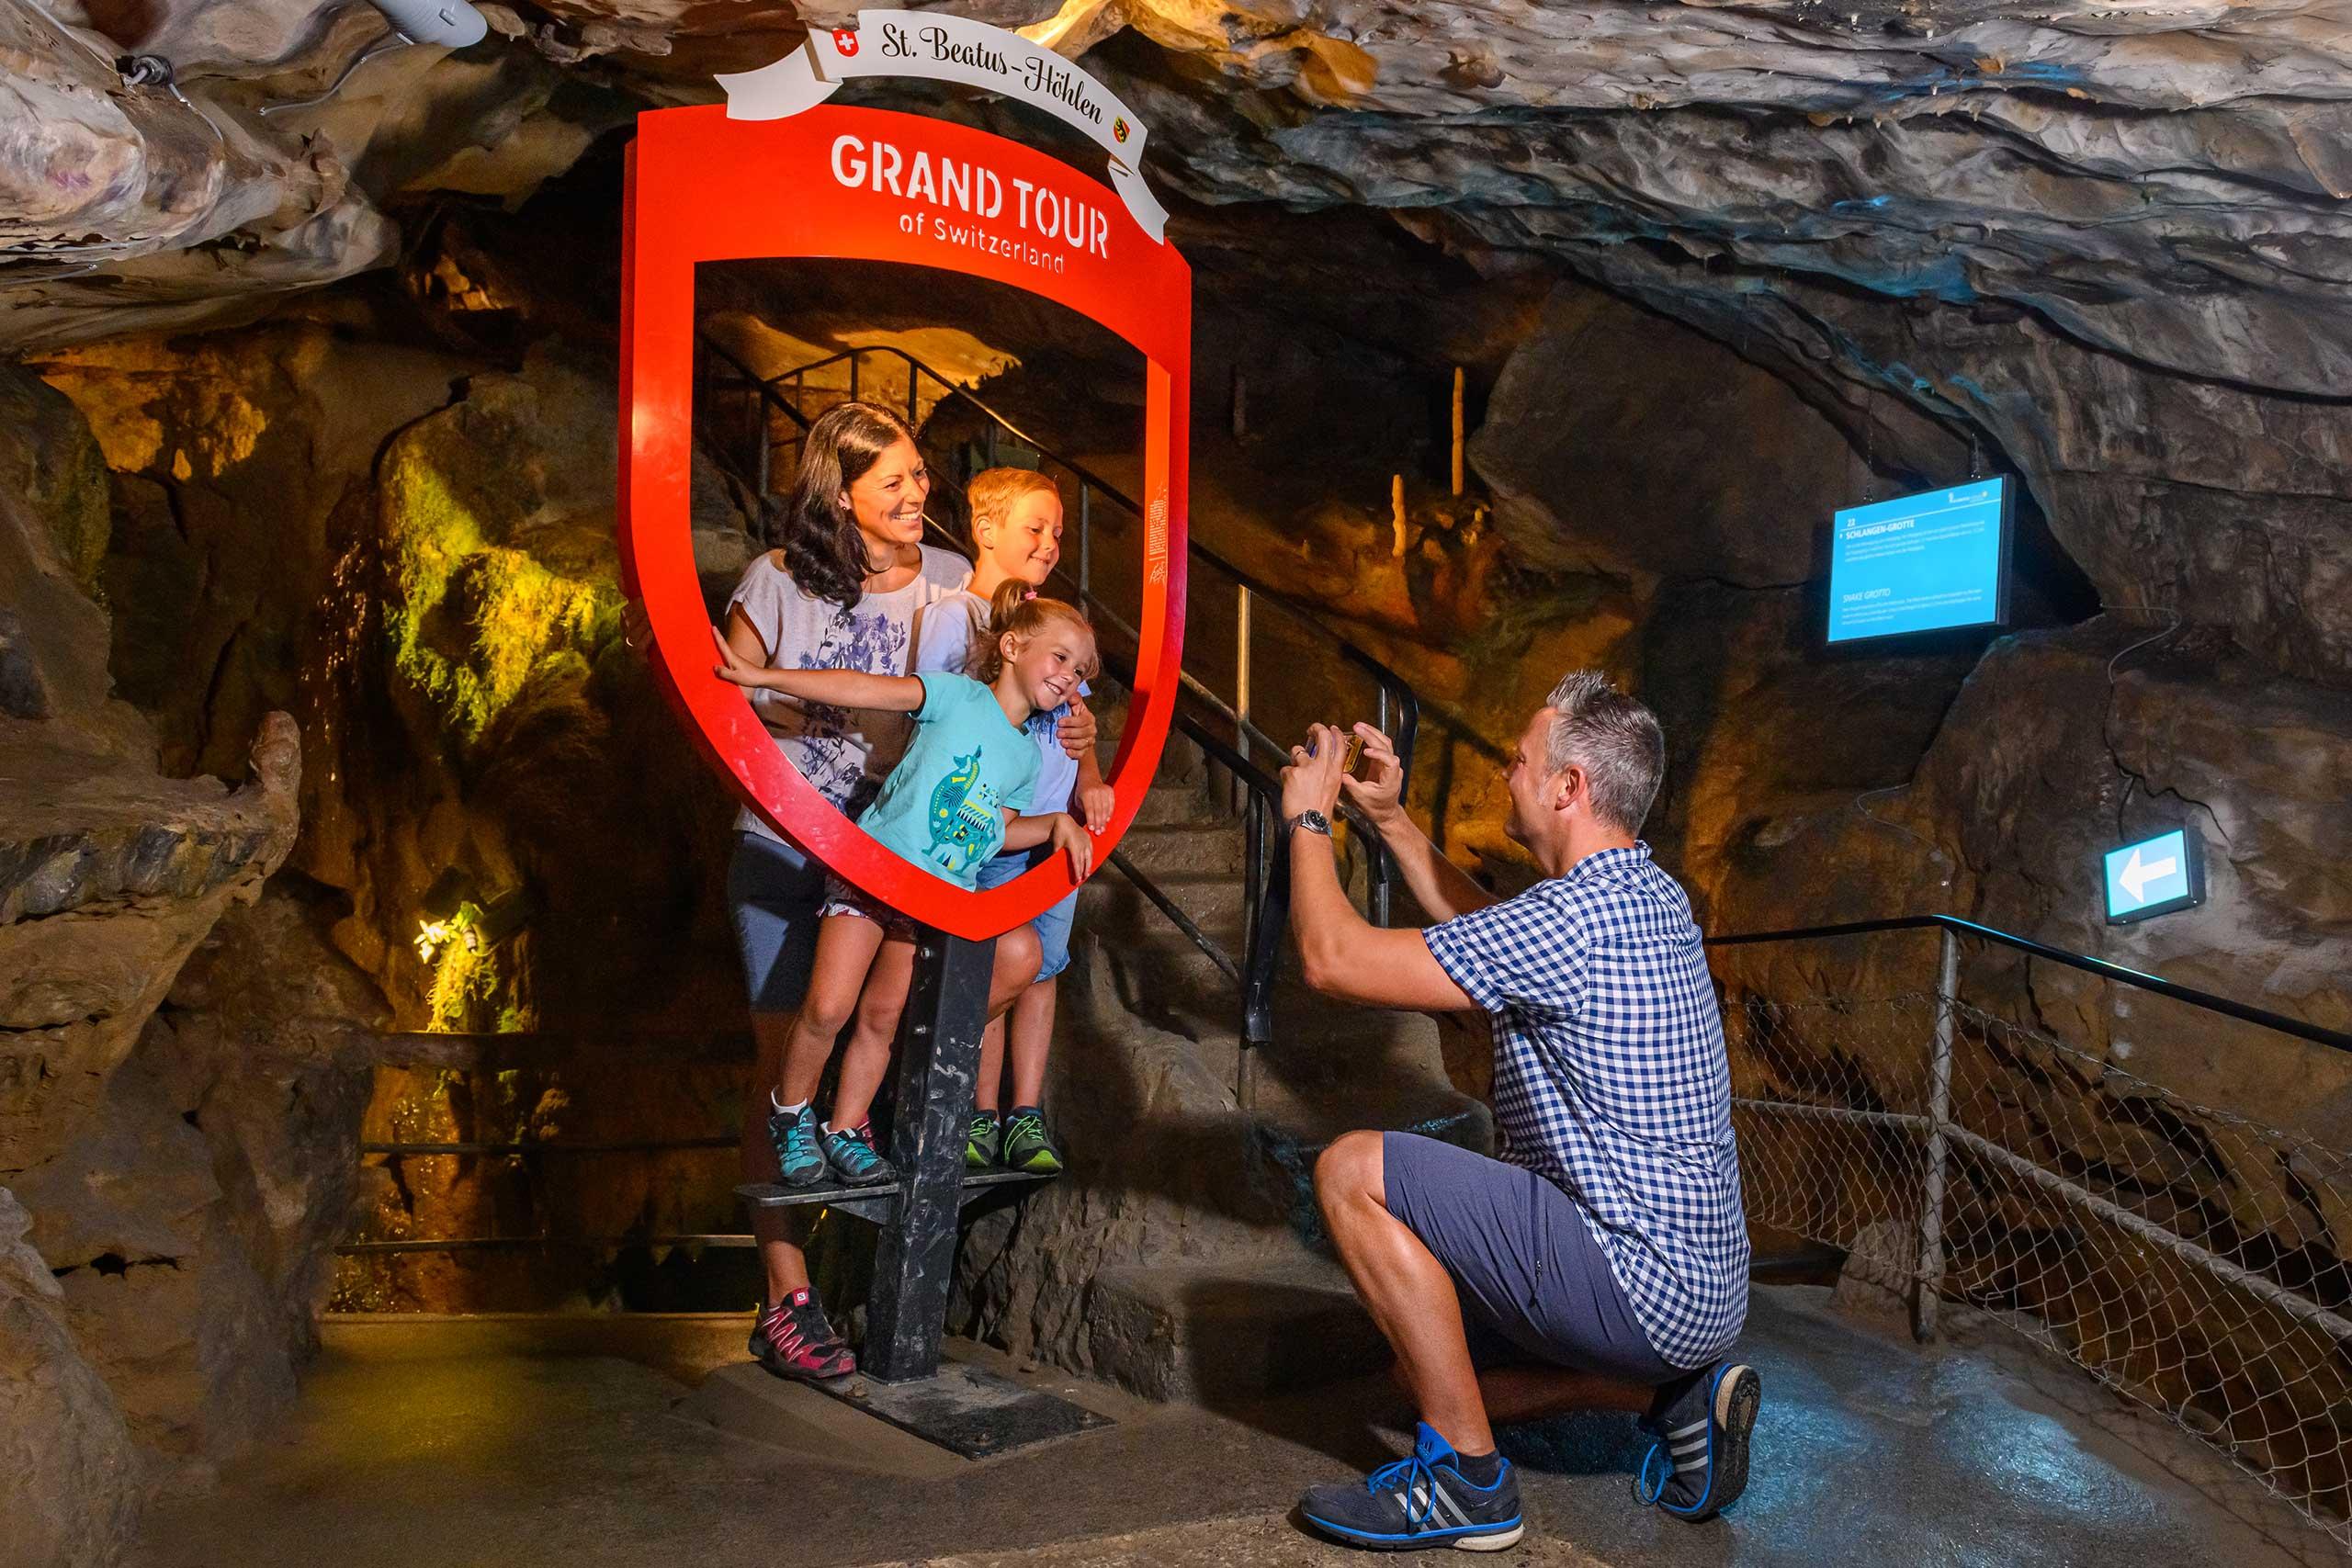 beatushoehlen-grand-tour-bogen-familie-foto-berginneres.jpg